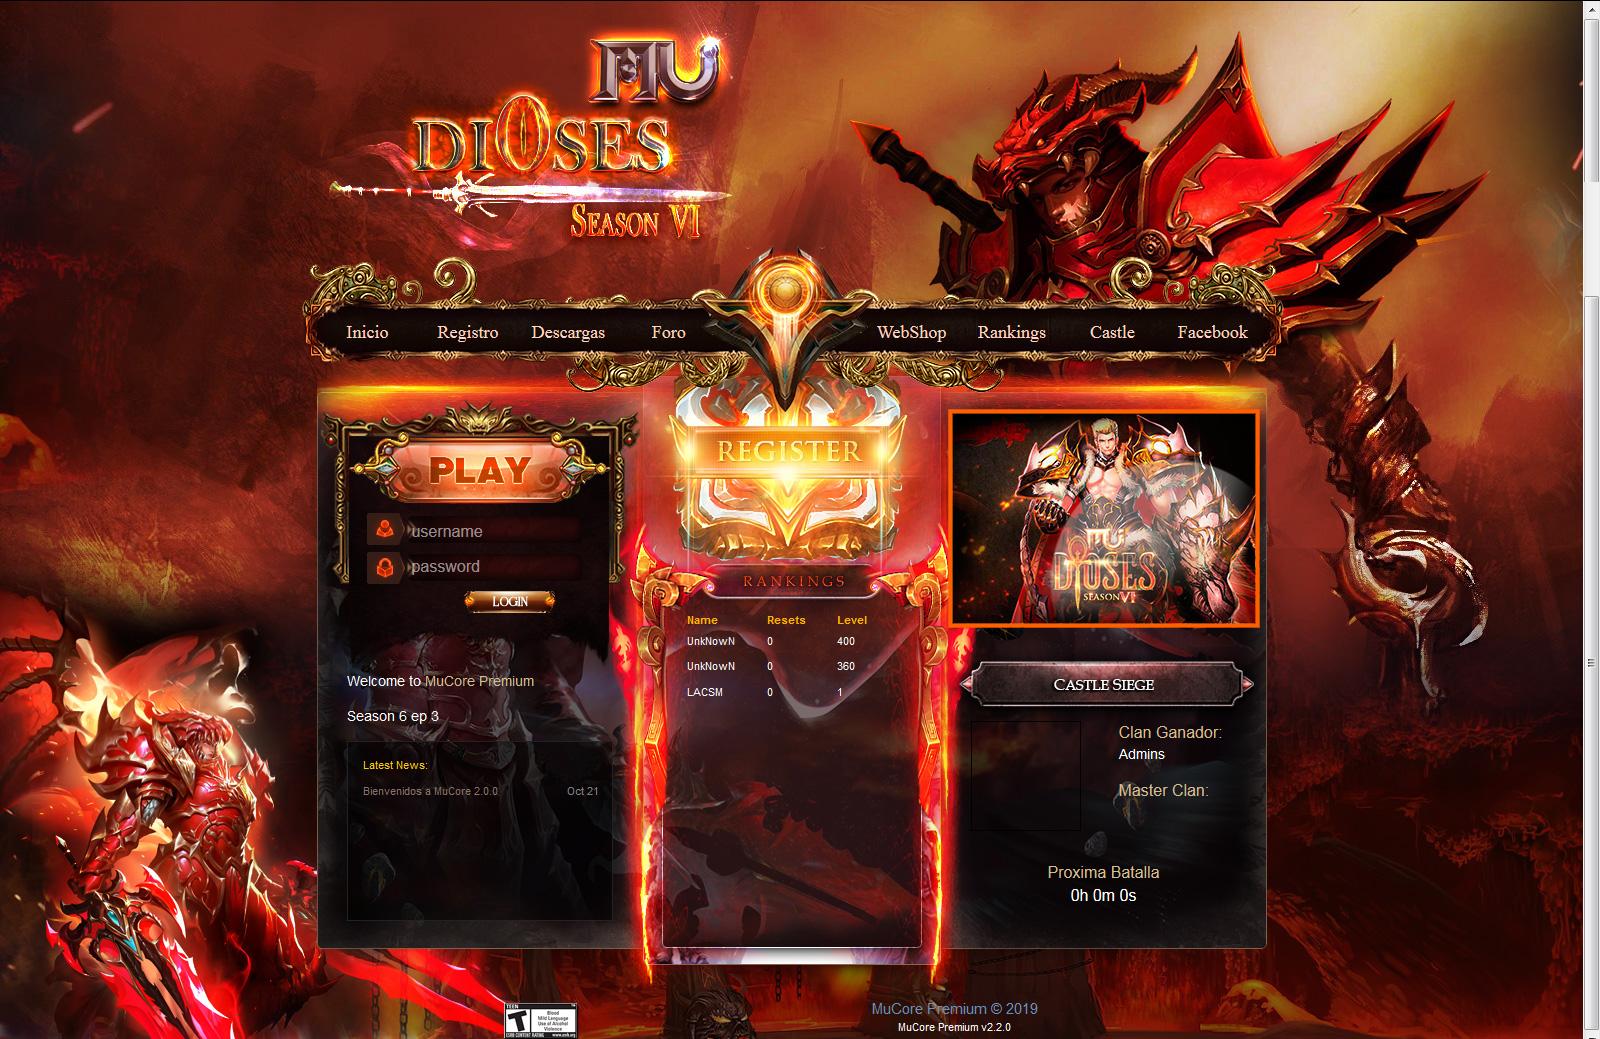 Template Mu Core 2.2 [ Aion By Fantoma & MuGods ] Web para Mu Online pirata Atualizado MuCore 2.2 - Como criar servidor de mu online Season 14 - Participe do discord Galera MU.!